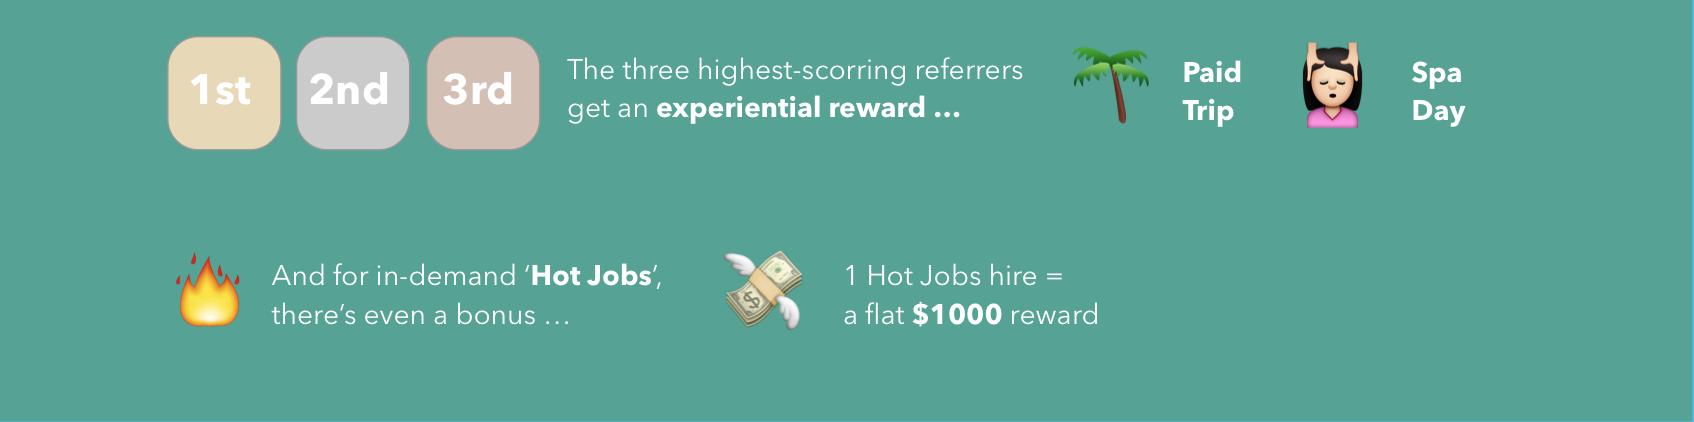 Sendgrid referral program rewards